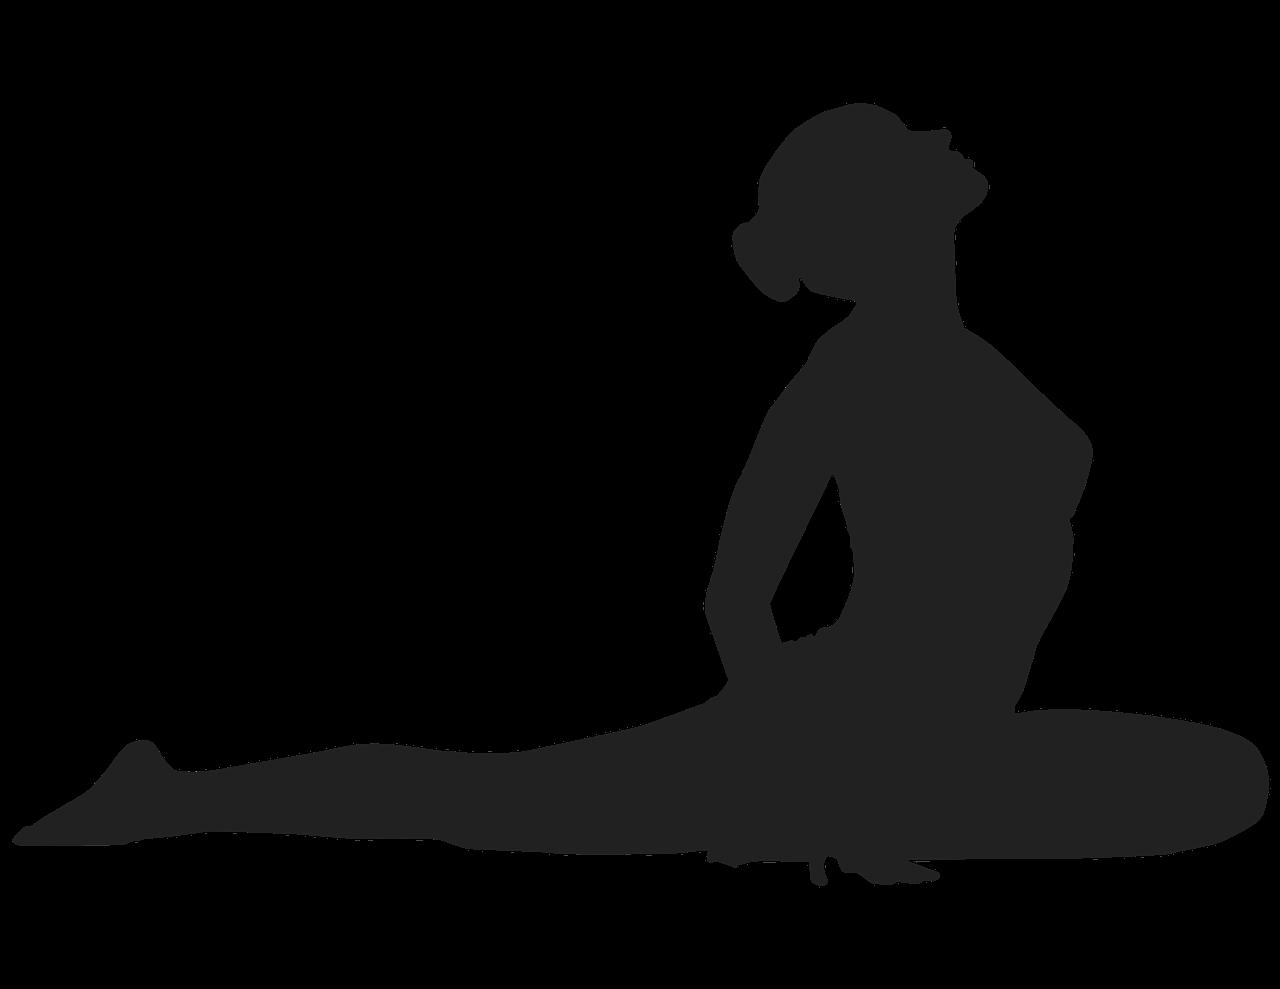 Silhouette woman 3092140 1280